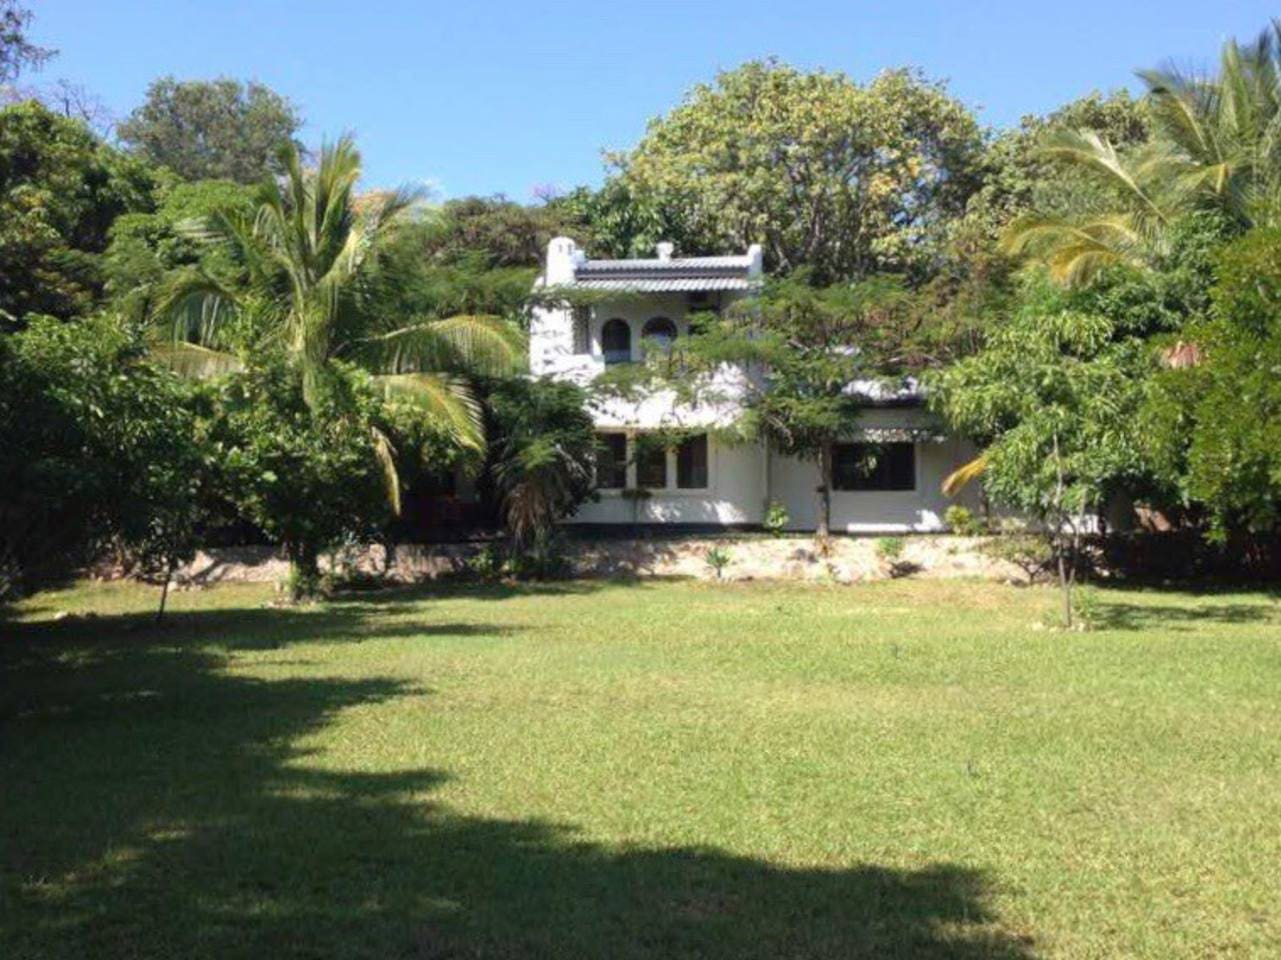 Garden view of cottage